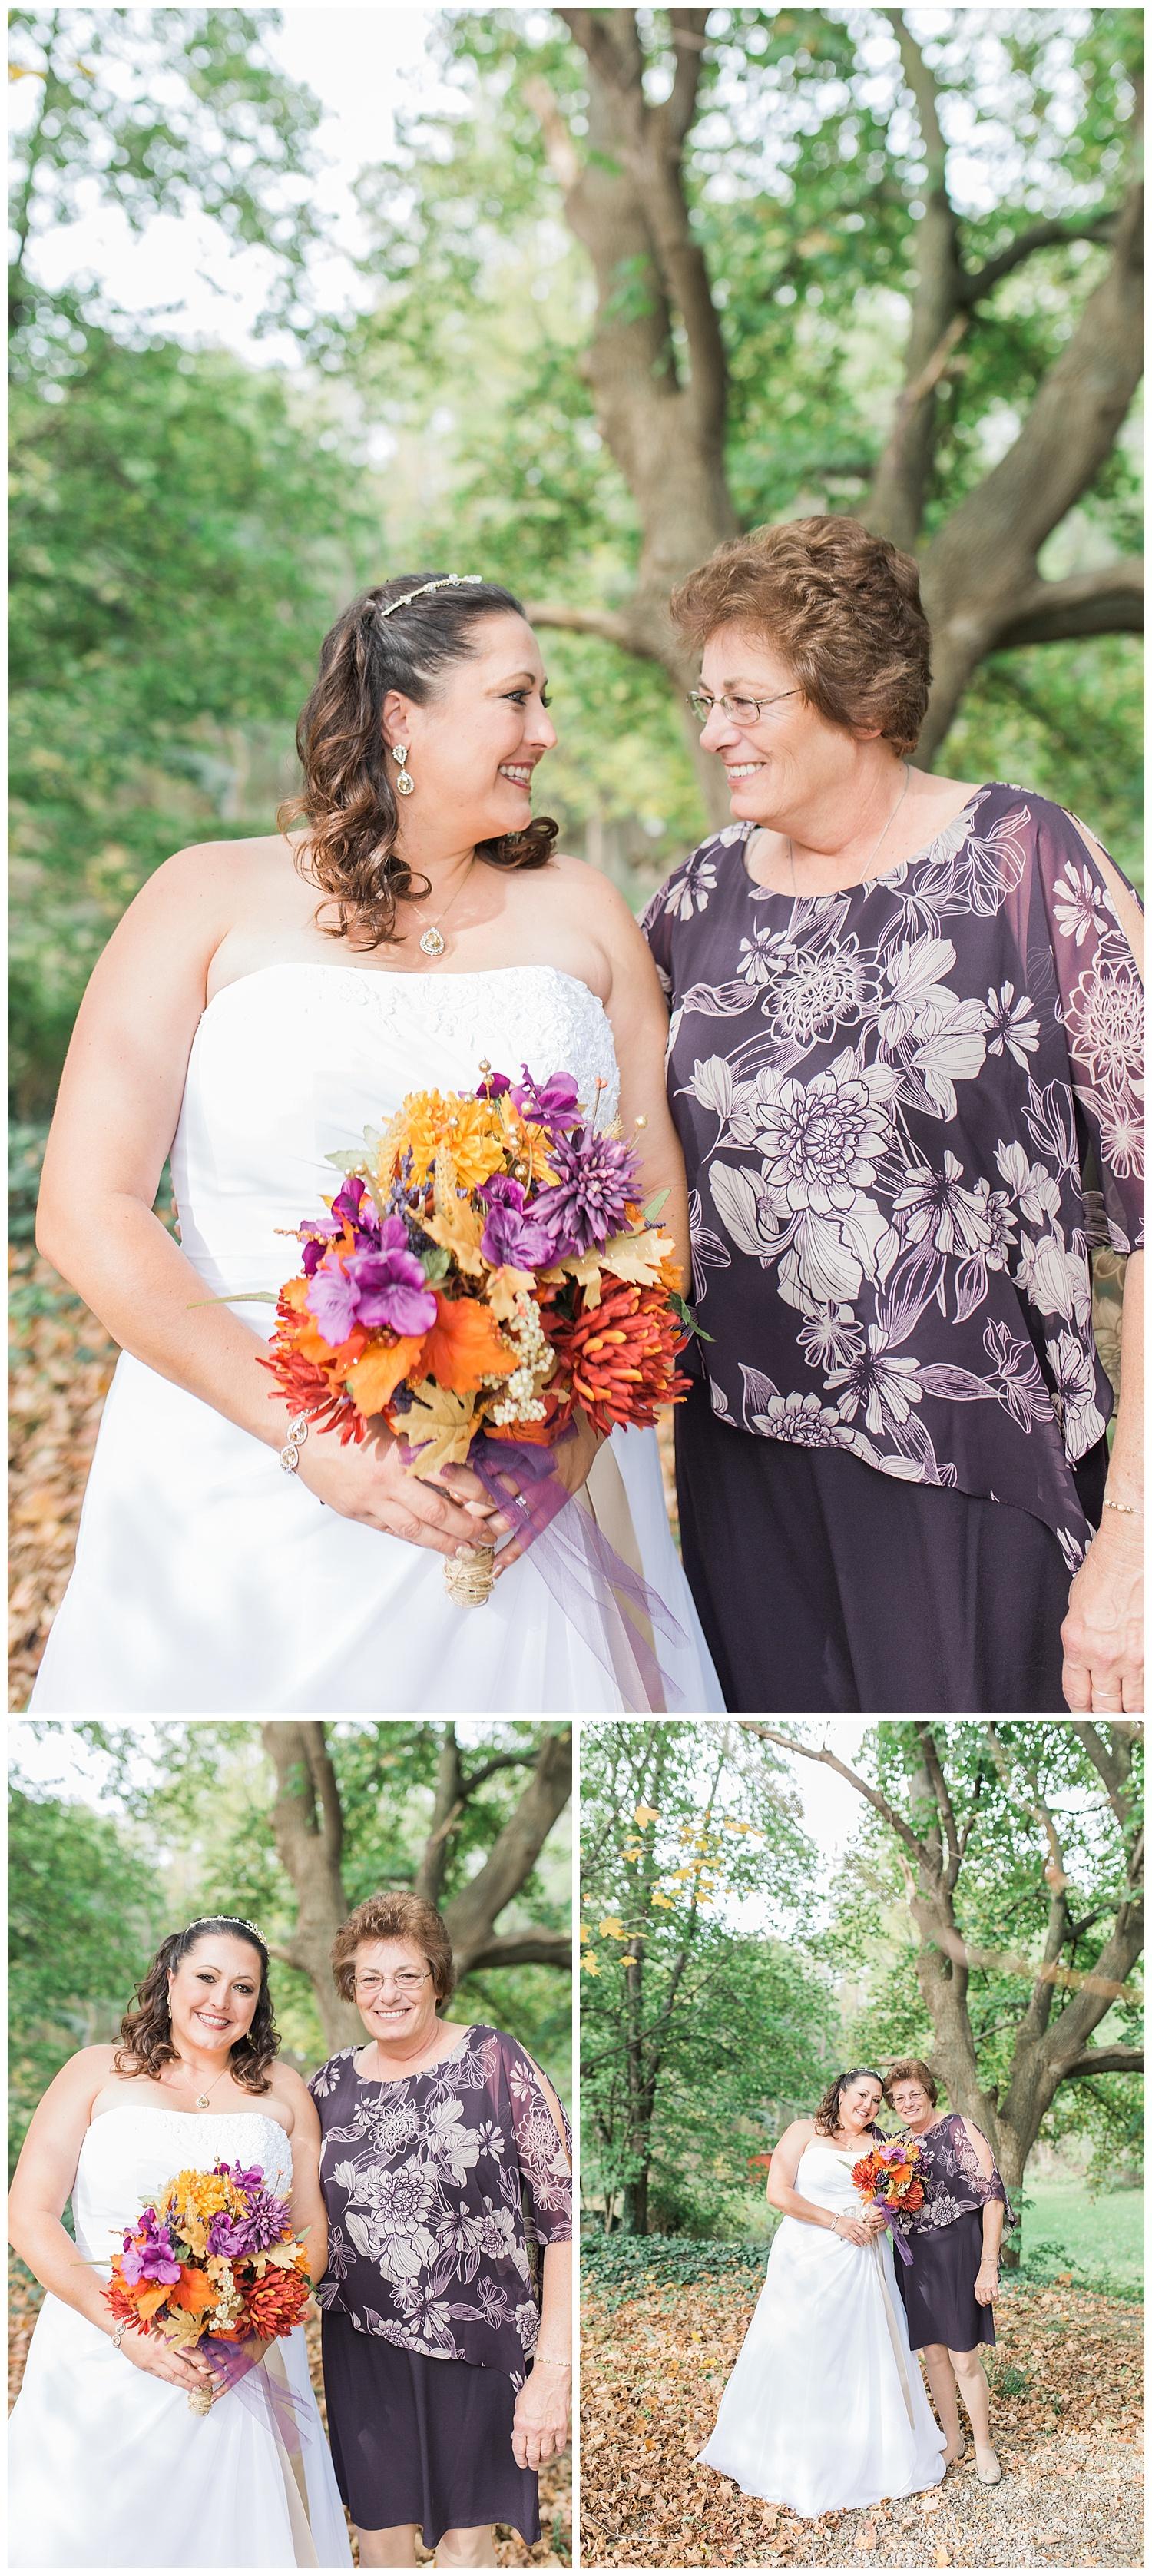 The Hall Wedding - York NY - Lass and Beau-143_Buffalo wedding photography.jpg